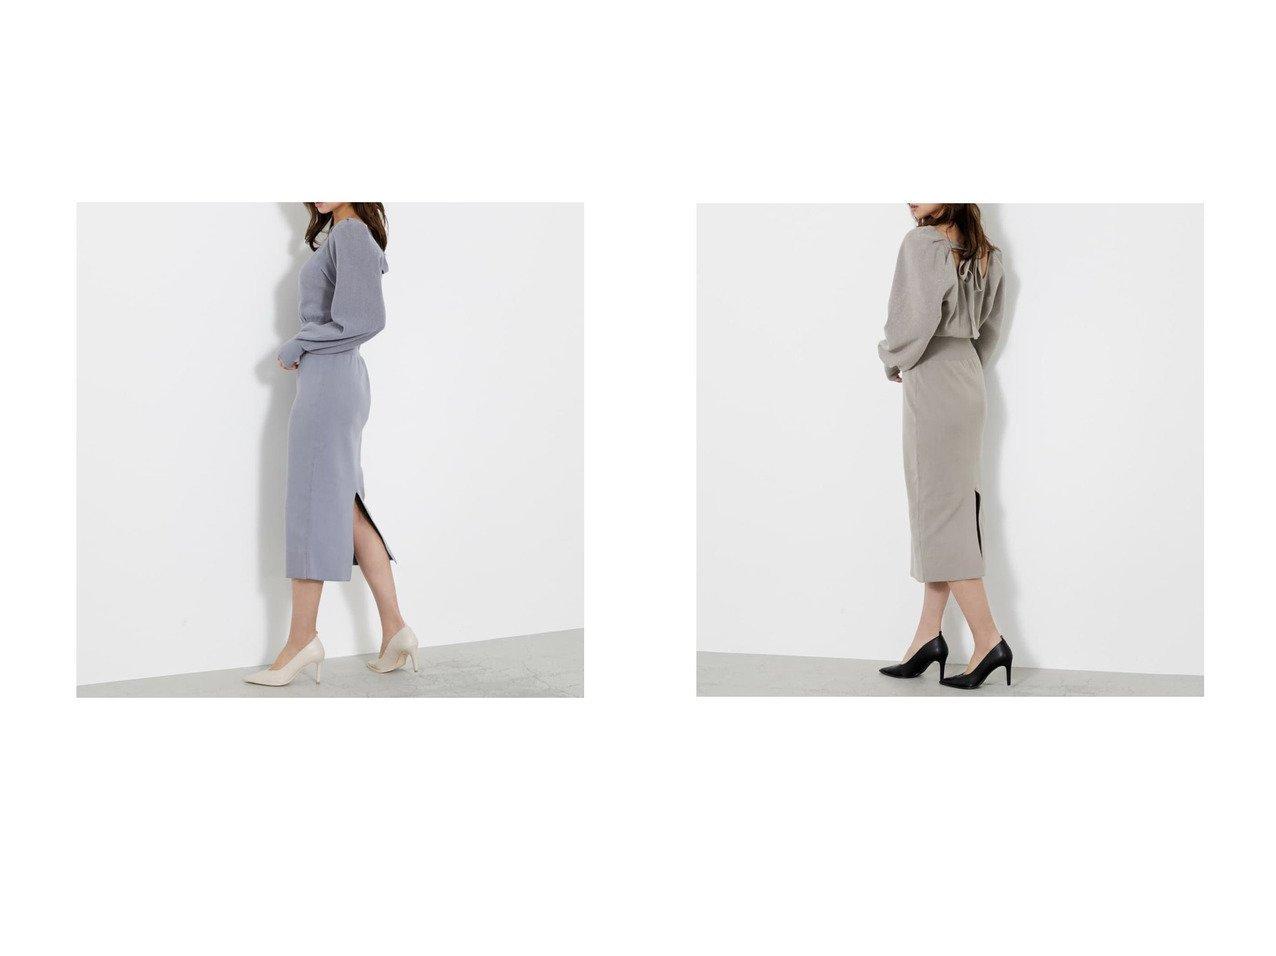 【rienda/リエンダ】のバックリボンスクエアネックKnit OP PNK&バックリボンスクエアネックKnit OP SLYのおすすめ!人気、トレンド・レディースファッションの通販 おすすめで人気の流行・トレンド、ファッションの通販商品 メンズファッション・キッズファッション・インテリア・家具・レディースファッション・服の通販 founy(ファニー) https://founy.com/ ファッション Fashion レディースファッション WOMEN トップス Tops Tshirt ニット Knit Tops 2021年 2021 2021 春夏 S/S SS Spring/Summer 2021 S/S 春夏 SS Spring/Summer ルーズ 春 Spring  ID:crp329100000018470